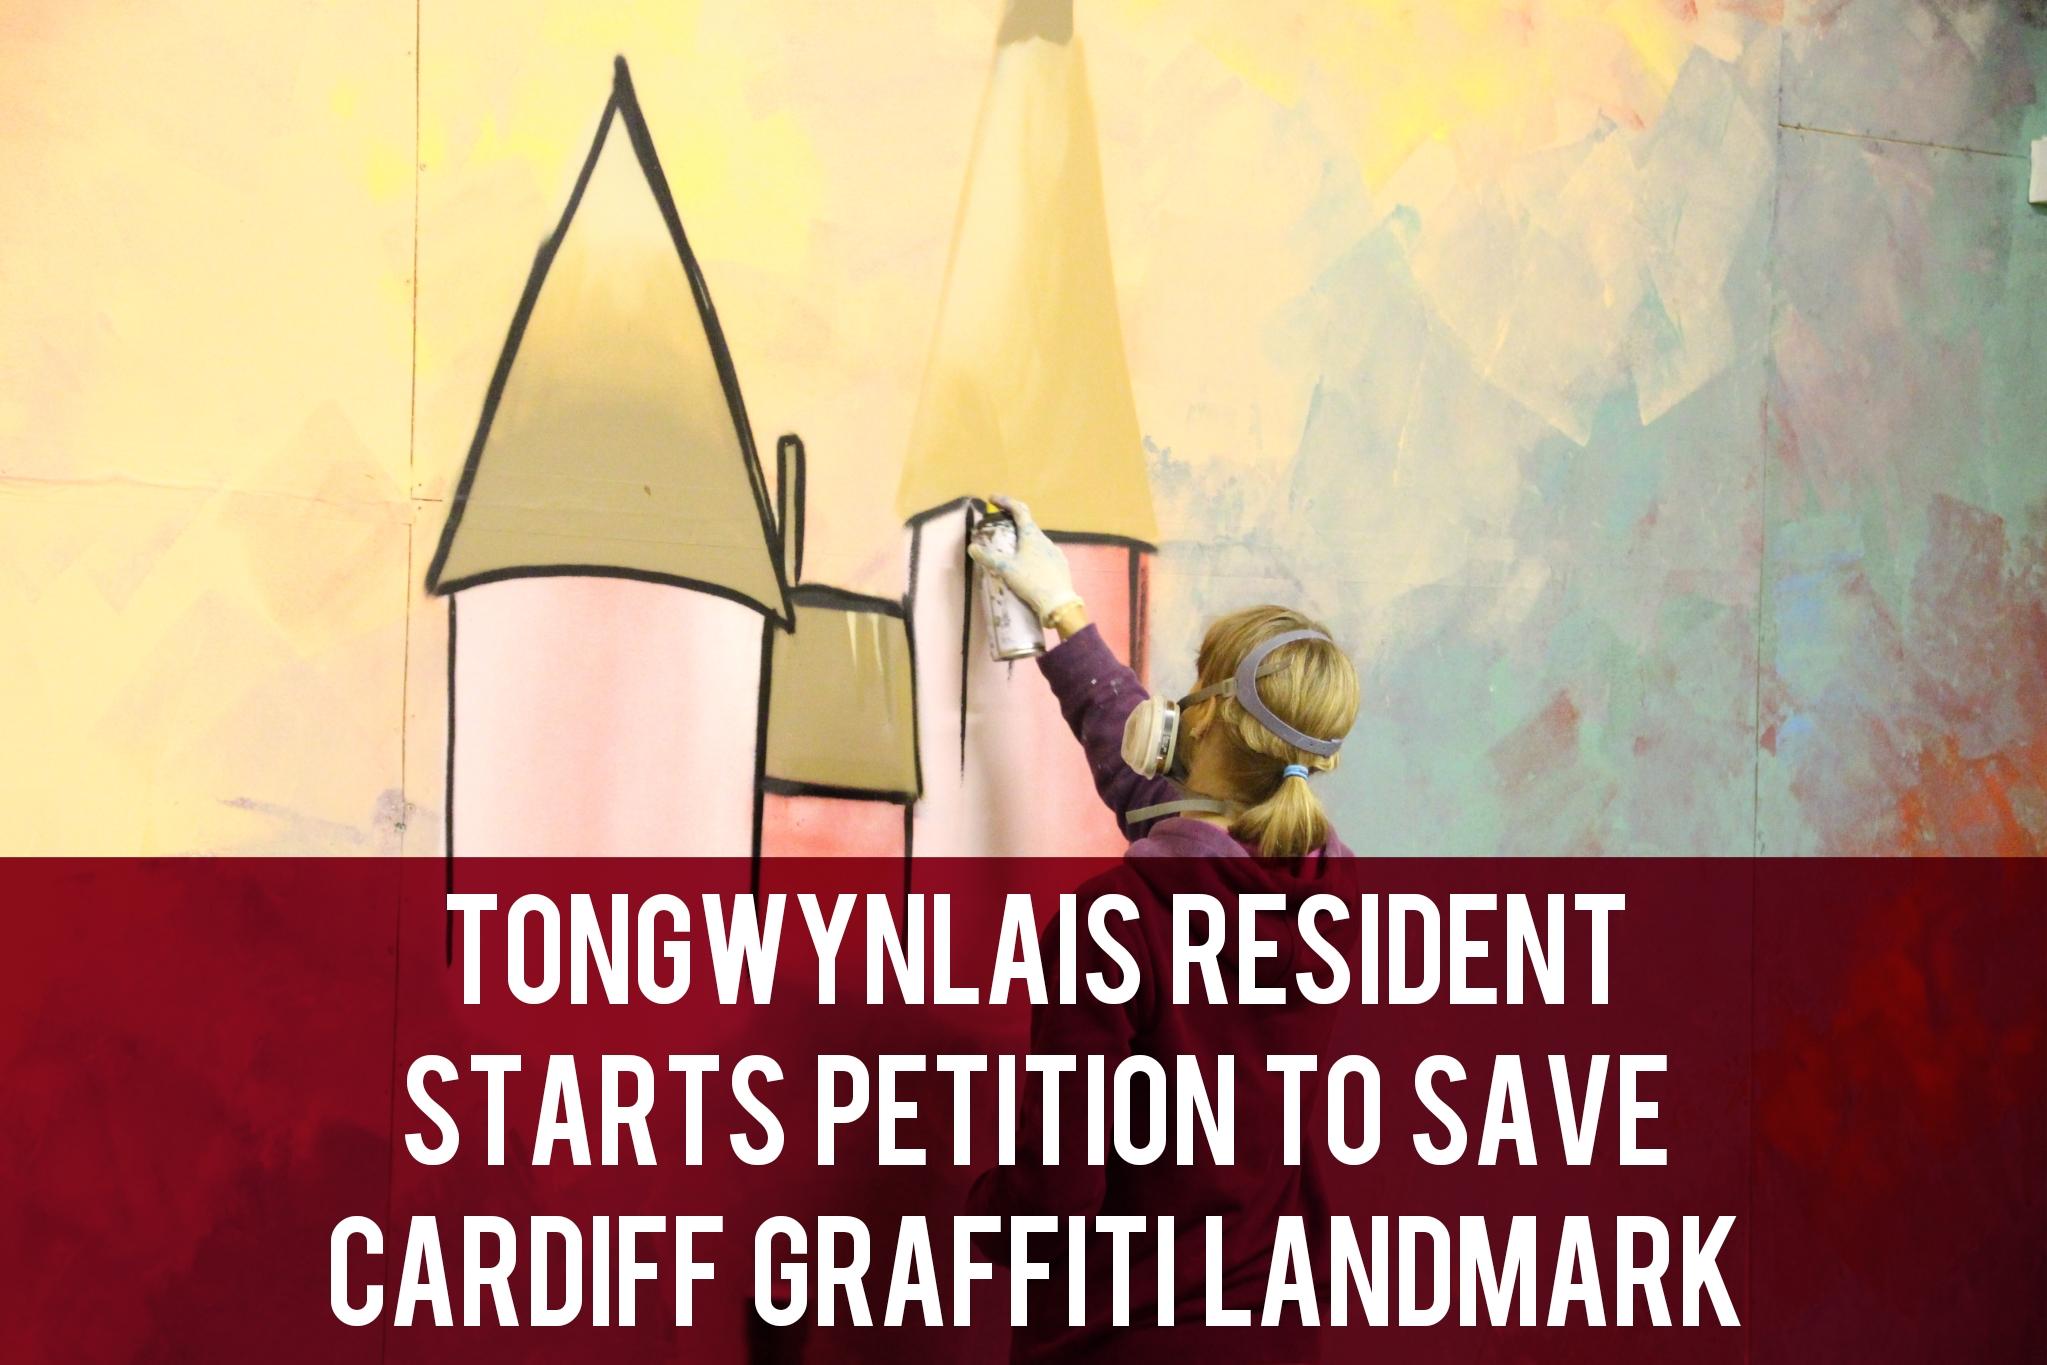 Tongwynlais resident graffiti petition header